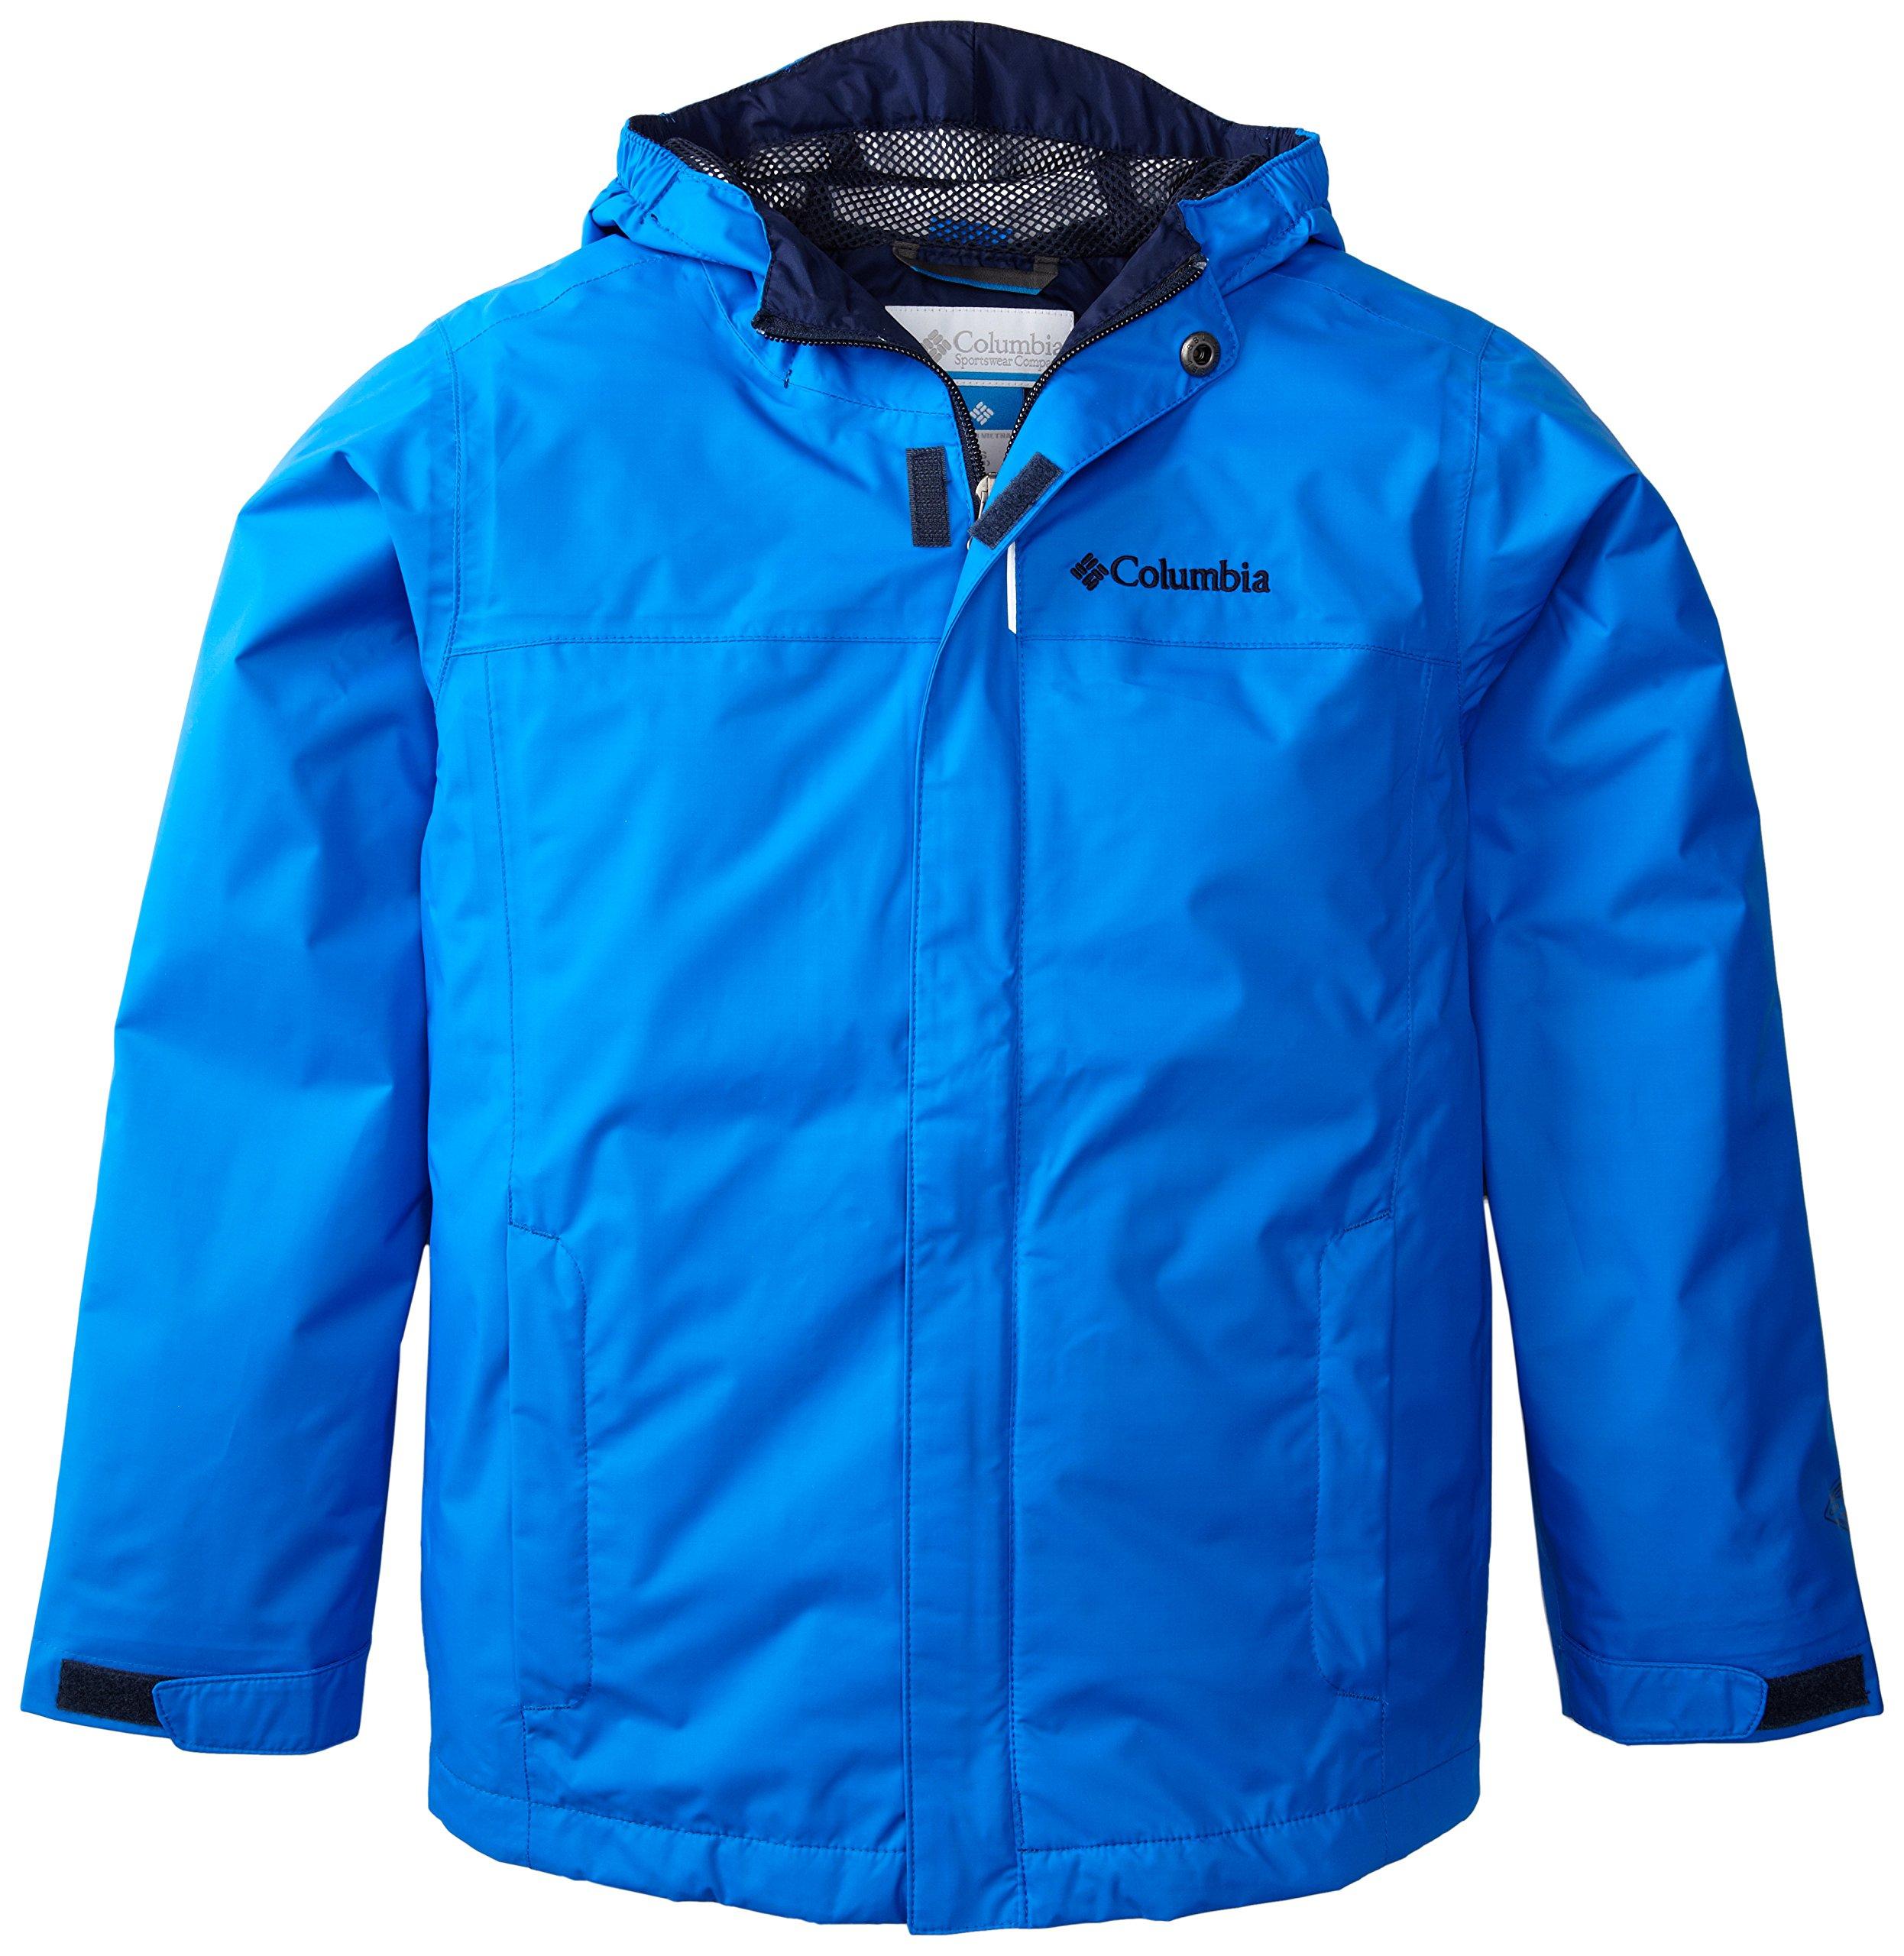 Columbia Big Boys' Watertight Jacket, Hyper Blue, Large